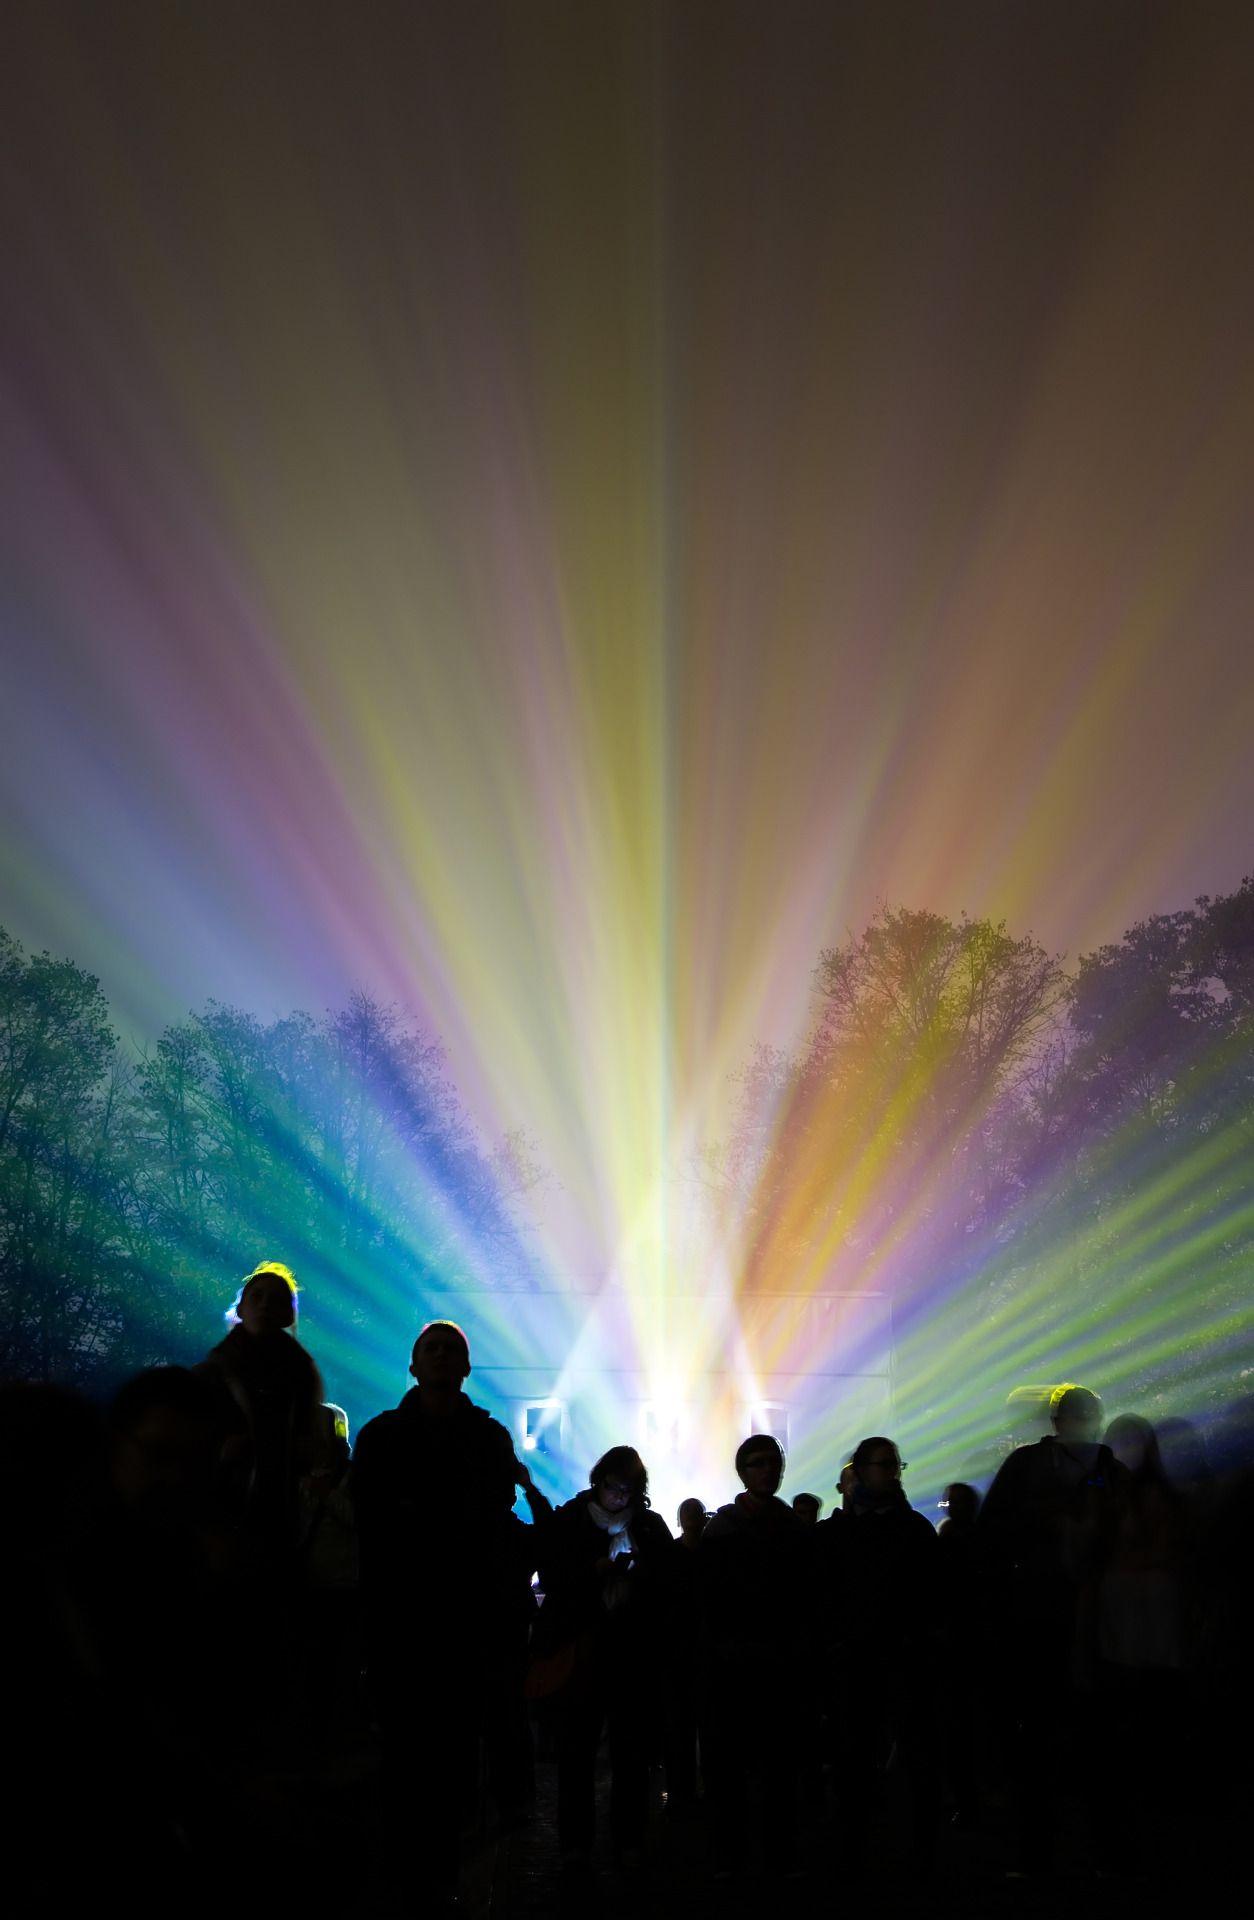 Festival of Lights 2014 by Denny Bitte